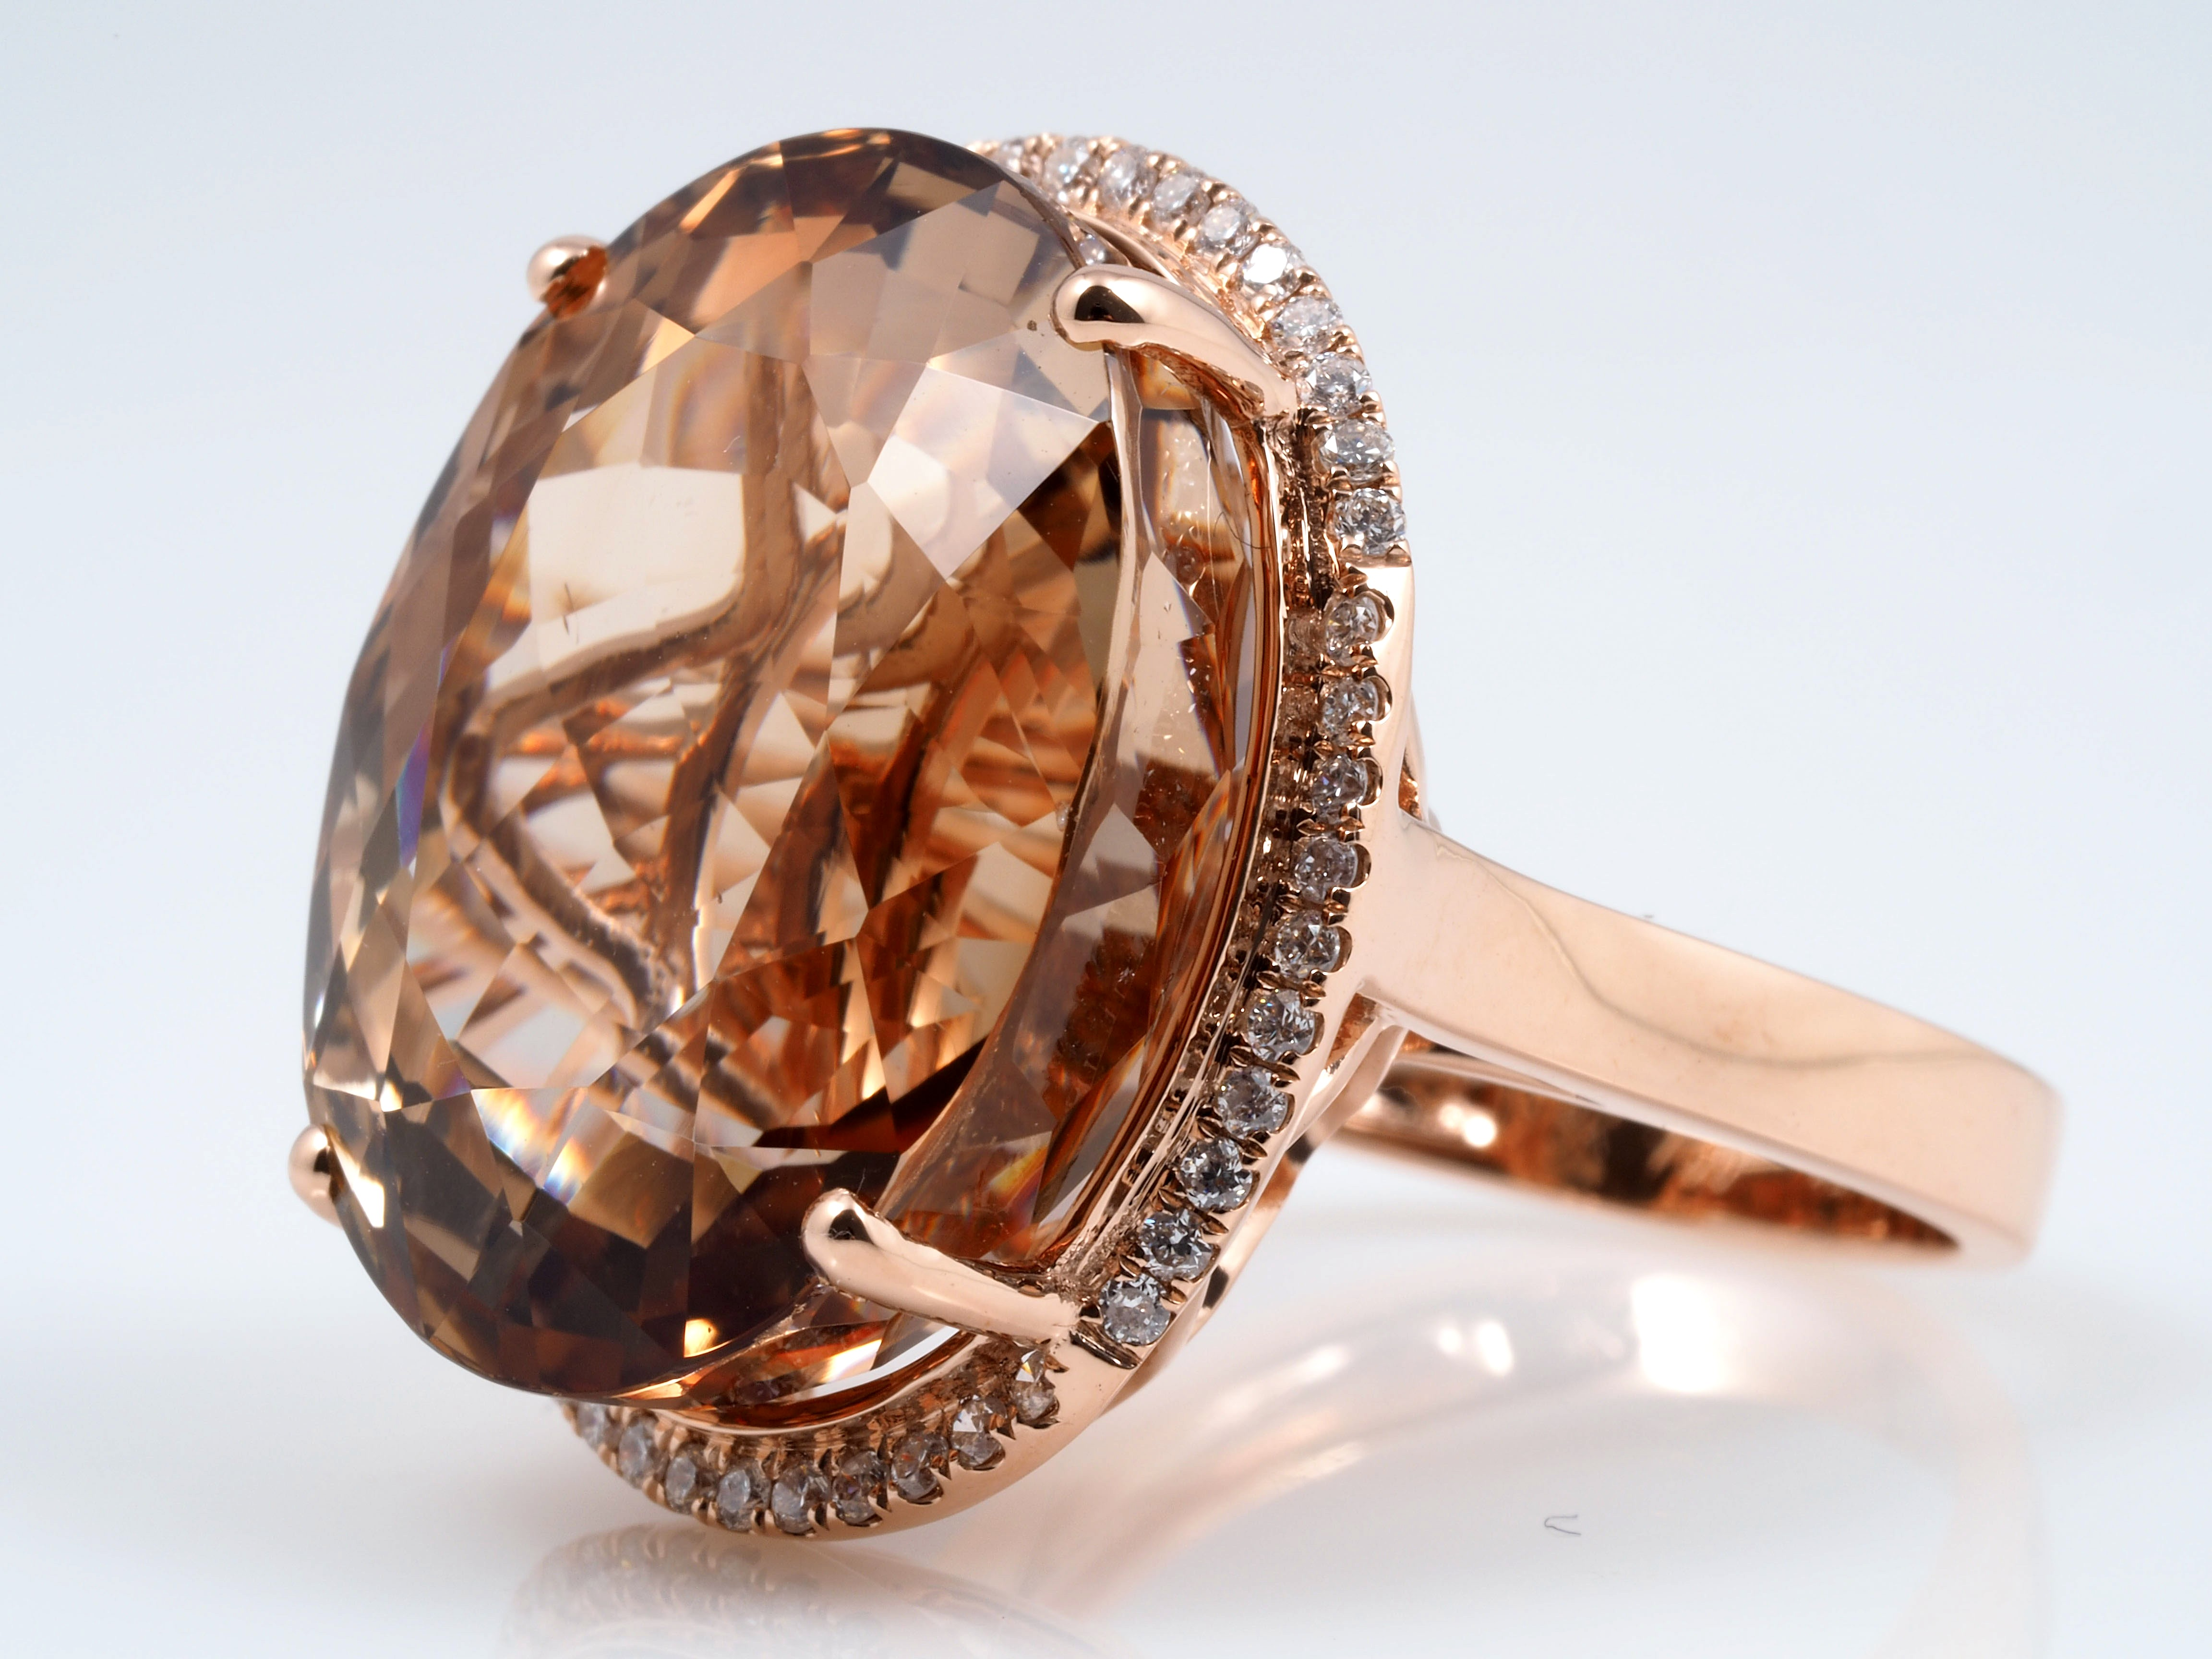 ring 43 21 karat brillanten imperial topas 750 gold wert ca eur ebay. Black Bedroom Furniture Sets. Home Design Ideas